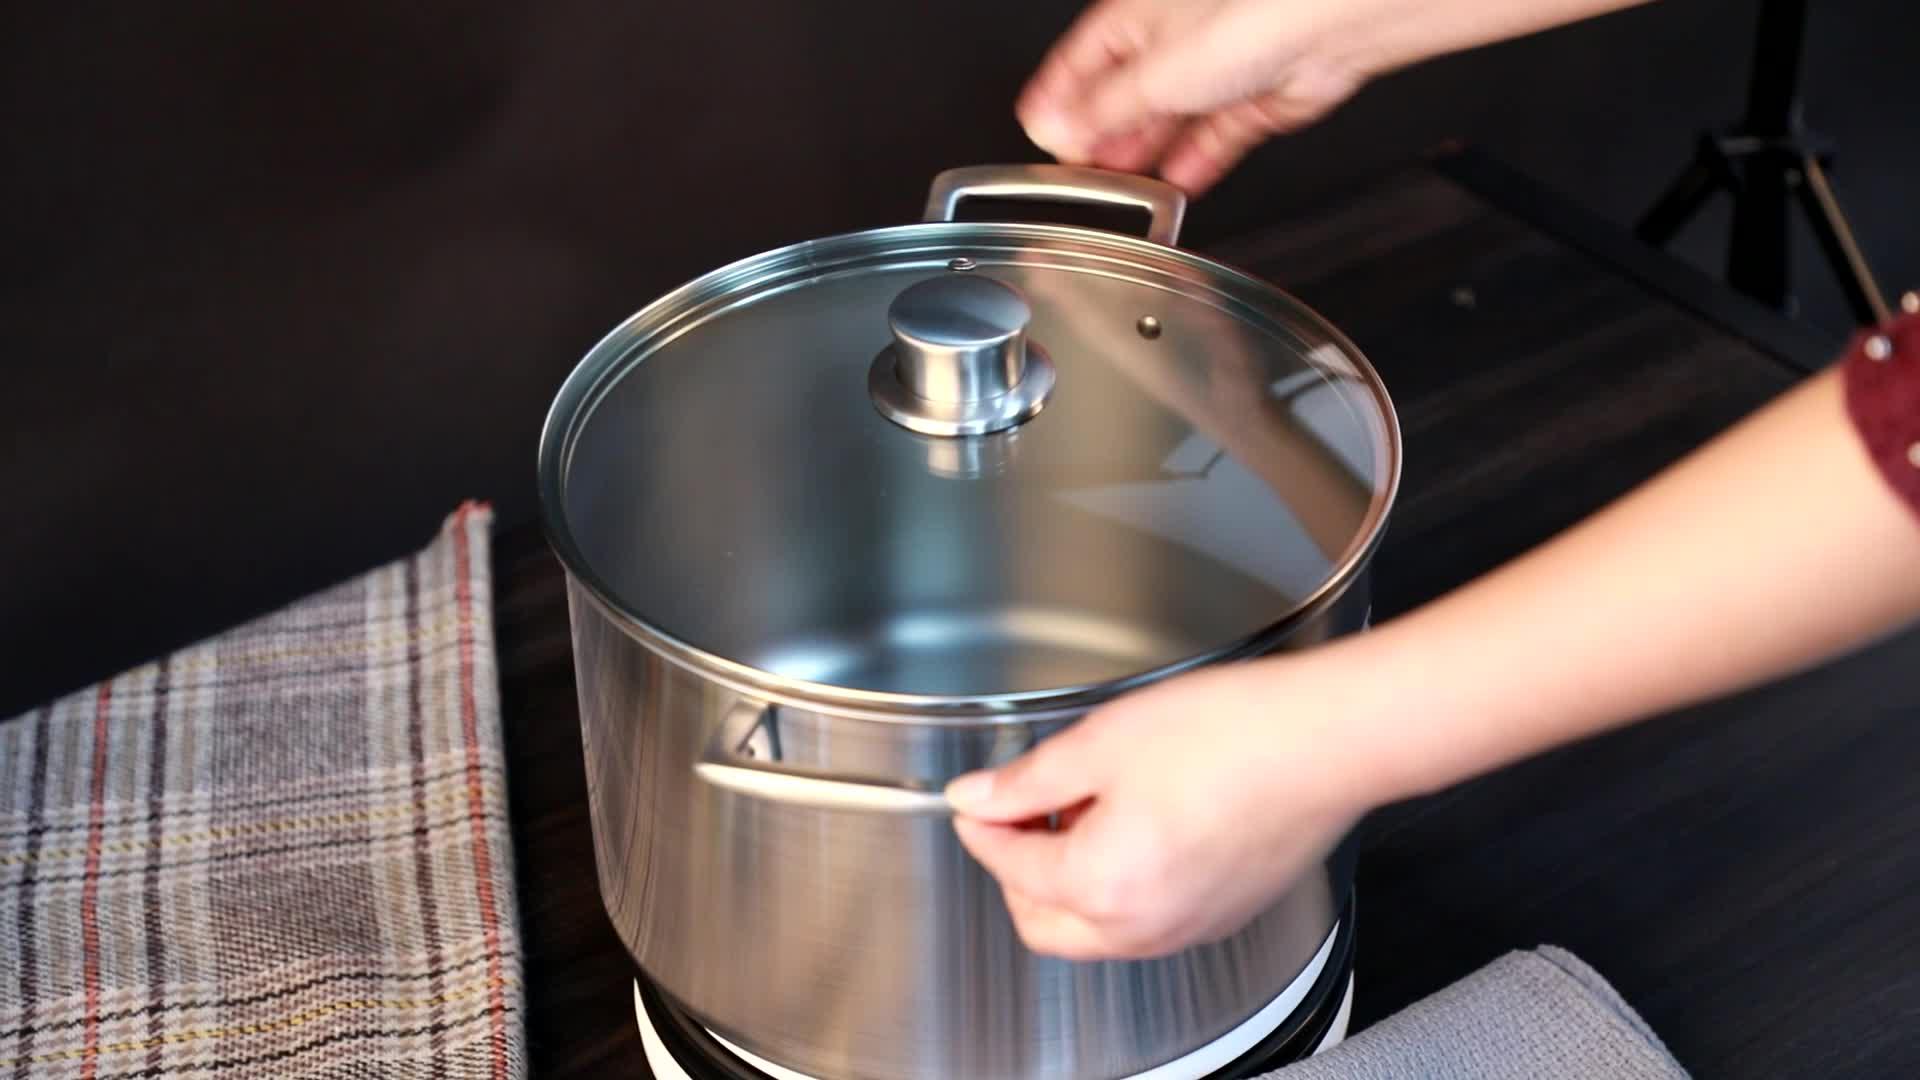 Non stick ผ่าตัดสแตนเลสสตีลไทเทเนียมชุดเครื่องครัว